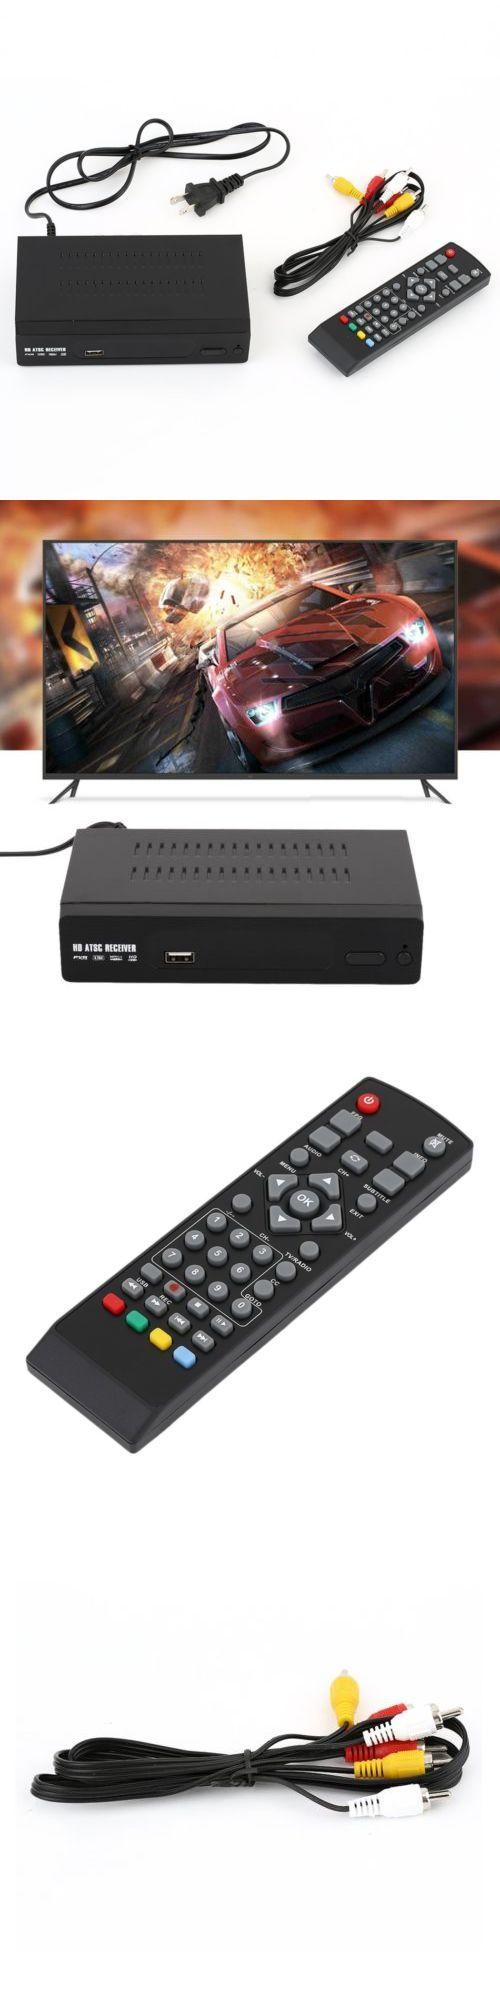 Home Audio: 1080P Atsc Digital Antenna Converter Vhf Local Tv Receiver Recording Box Lot Ba -> BUY IT NOW ONLY: $37.47 on eBay!